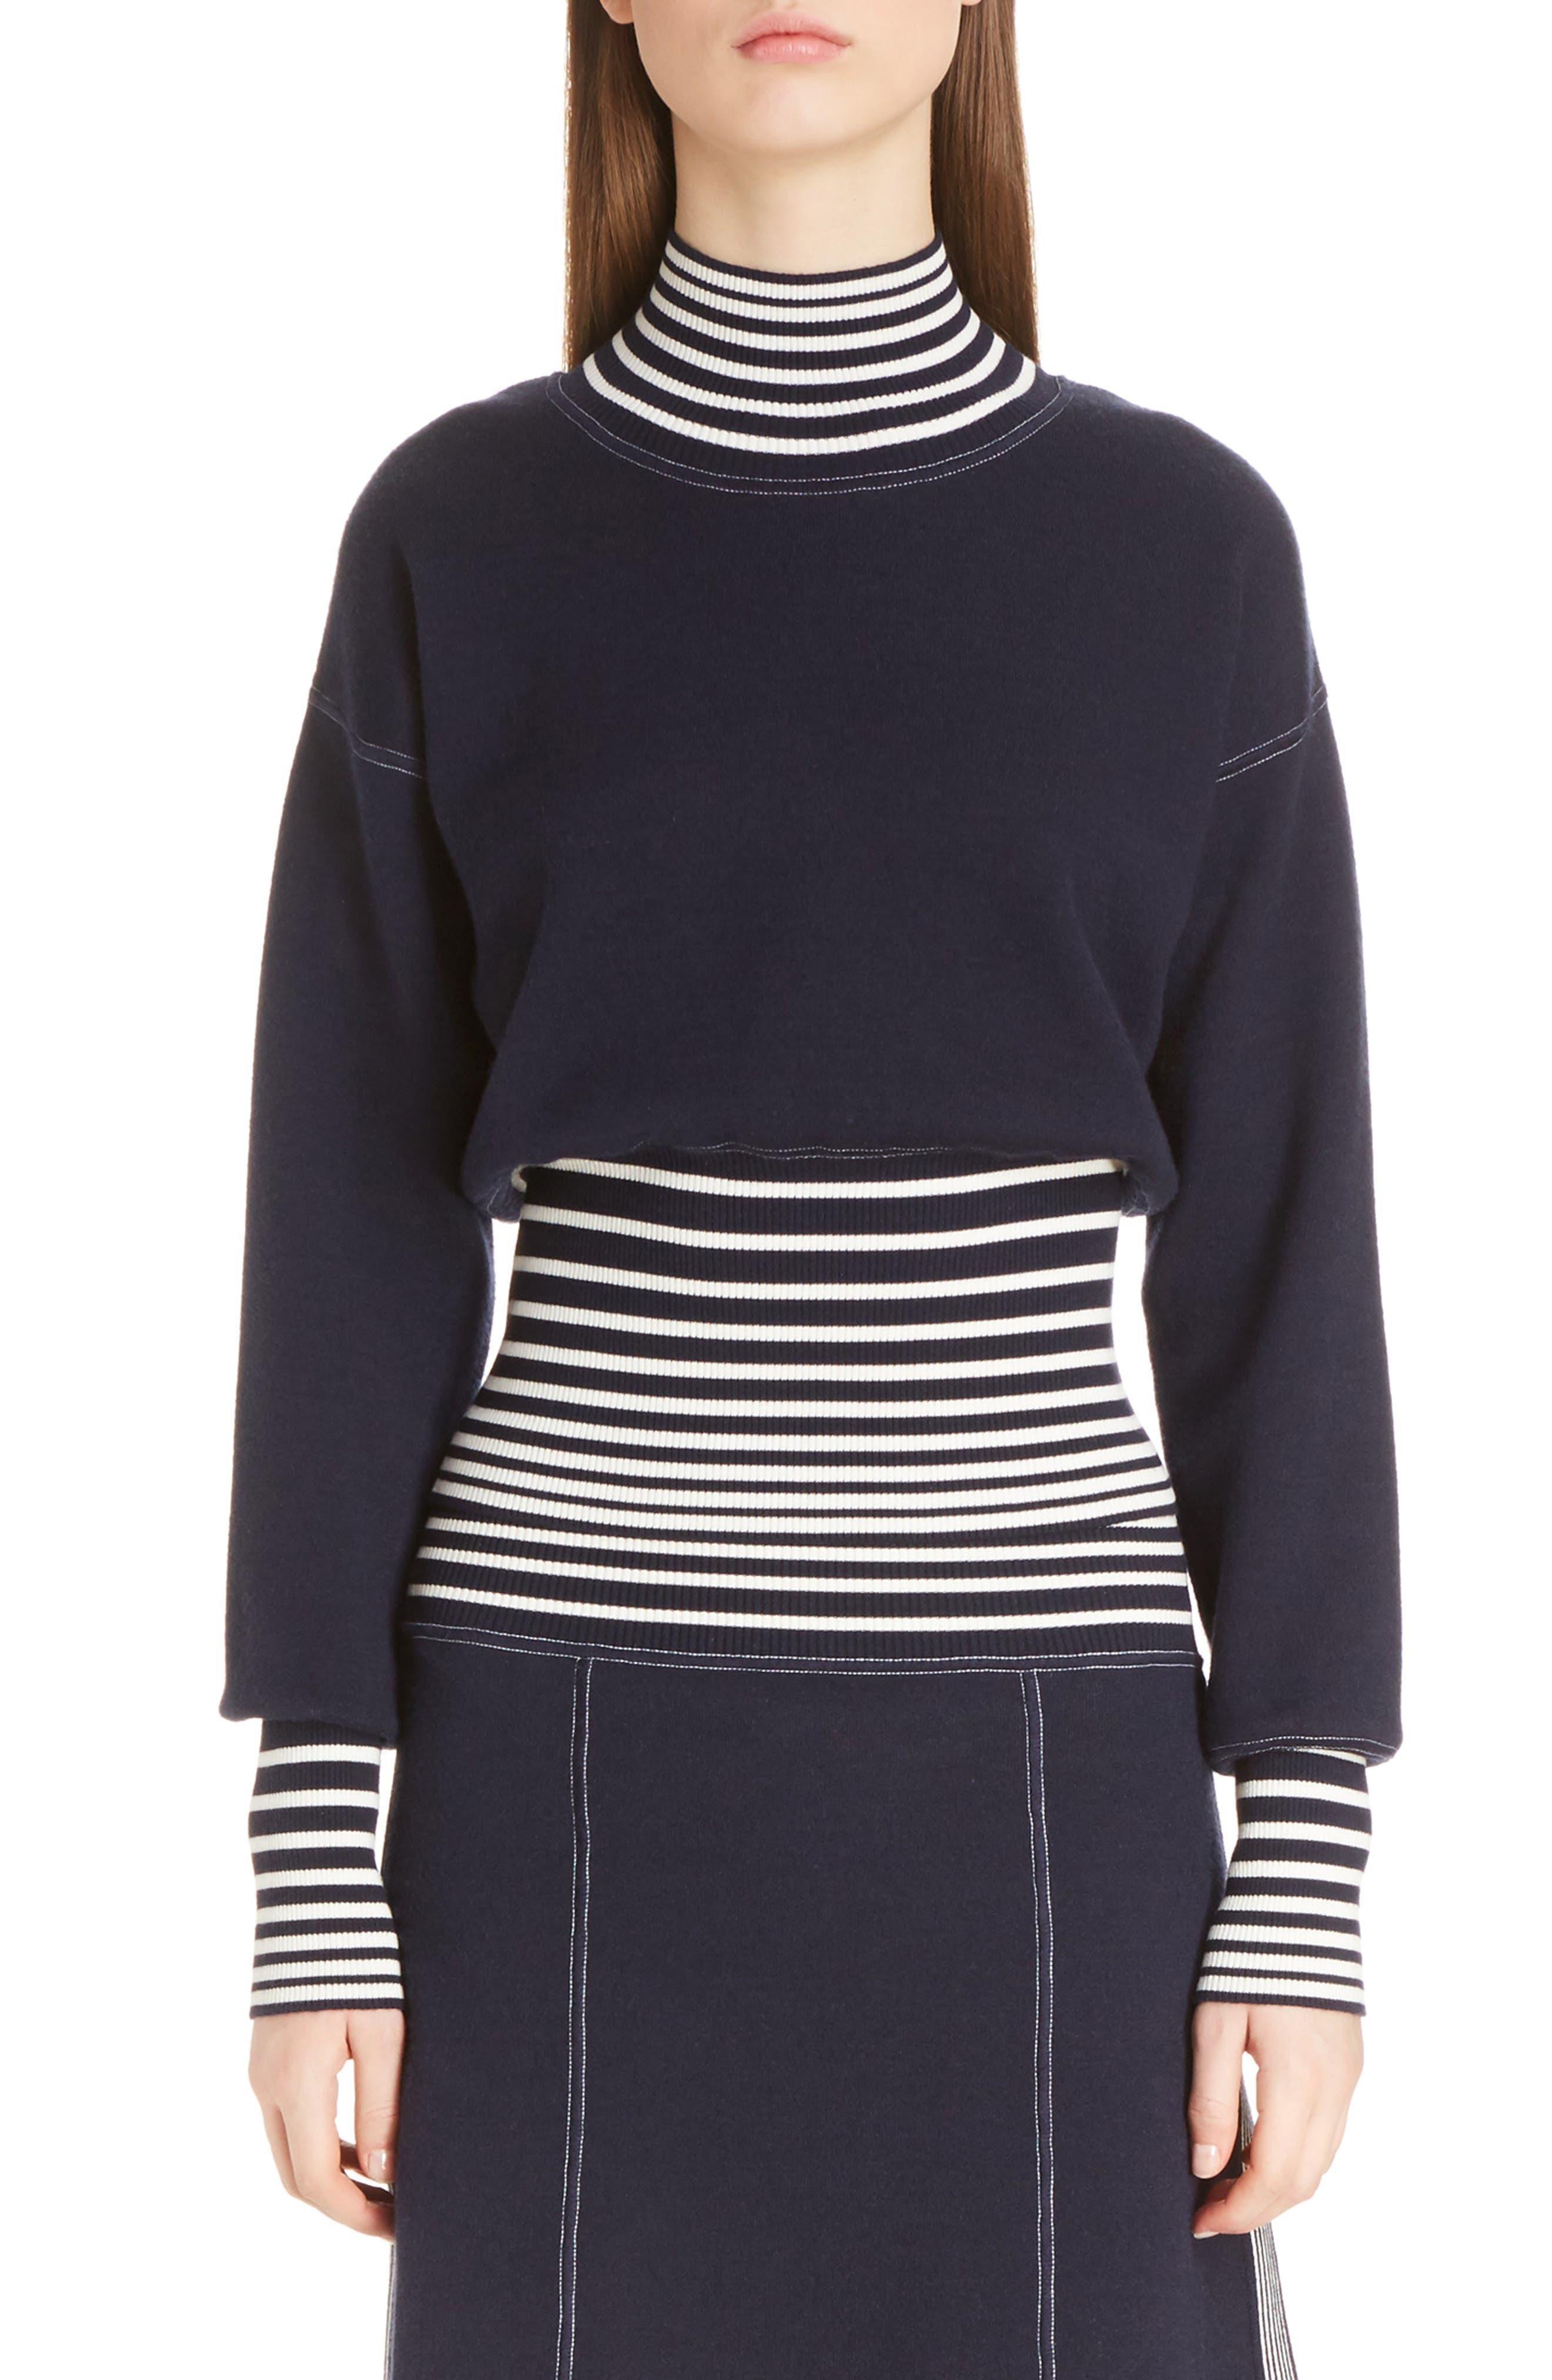 Loewe Stripe Knit Turtleneck